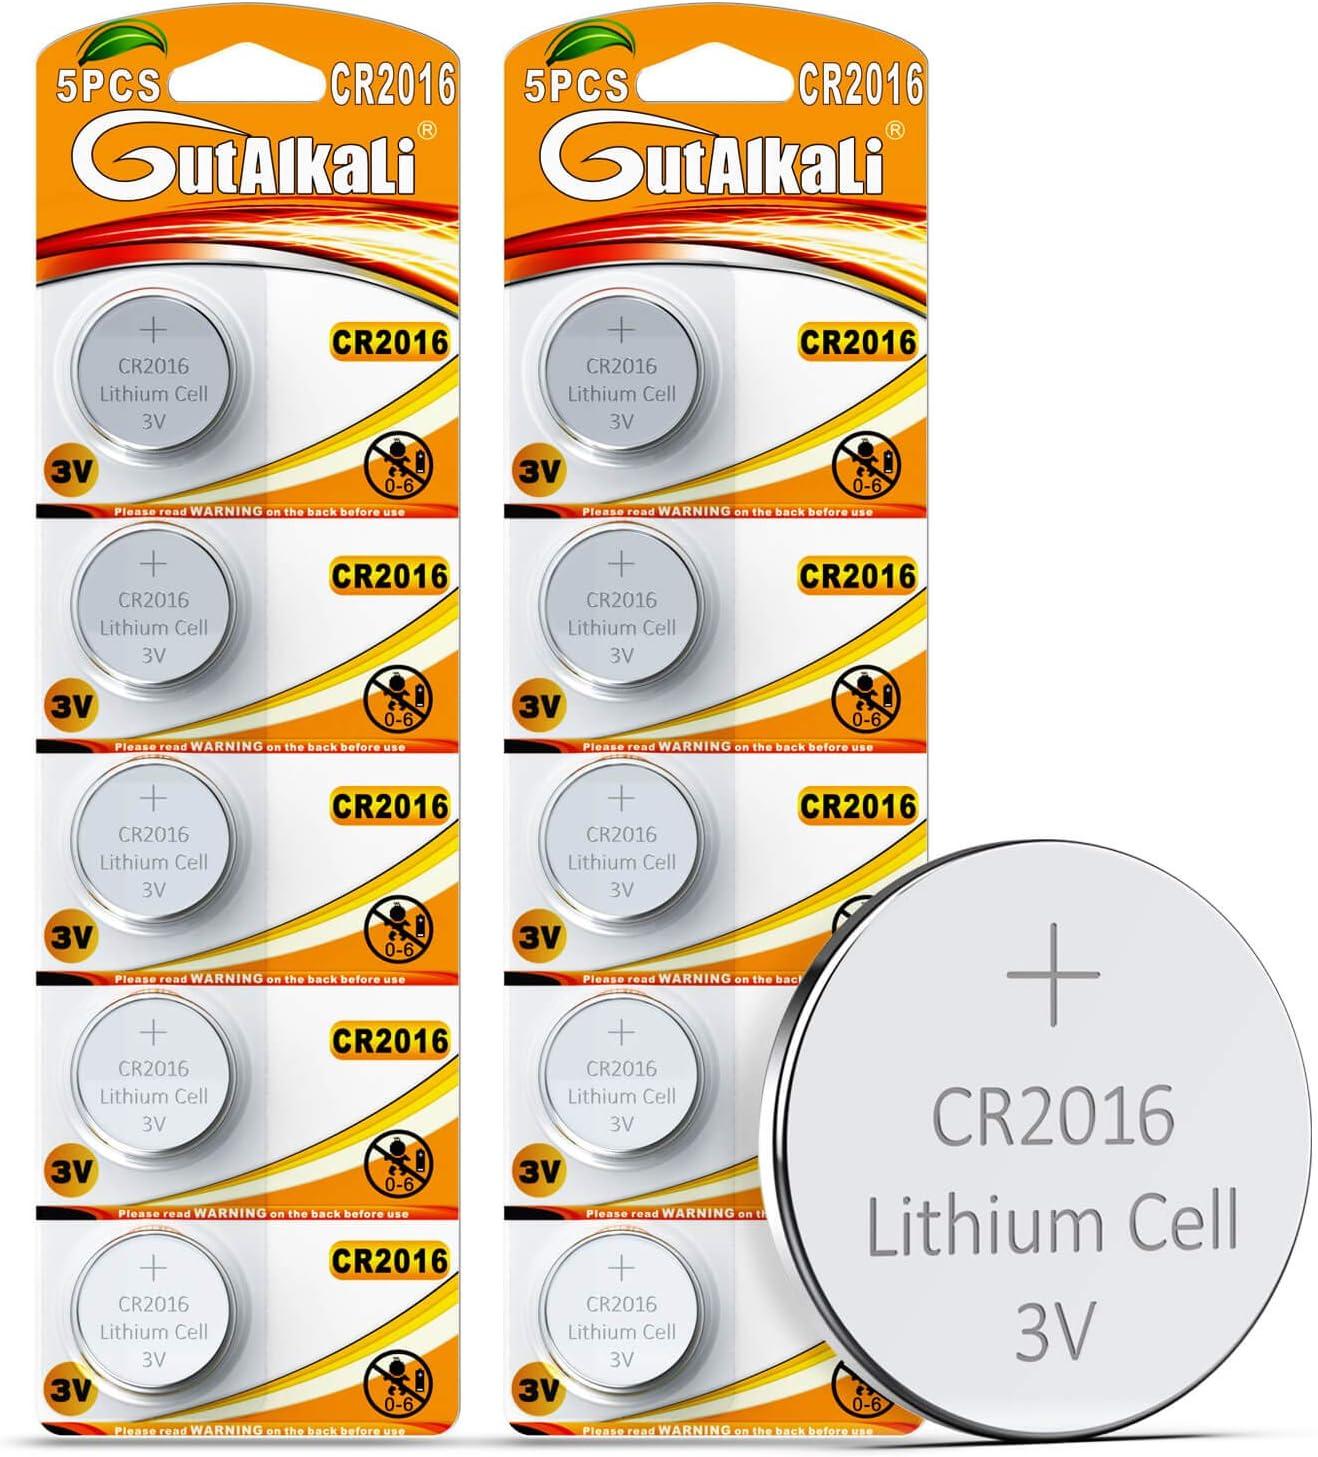 Gutalkali 10 Stück Cr2016 3v Batterien Lithium Elektronik